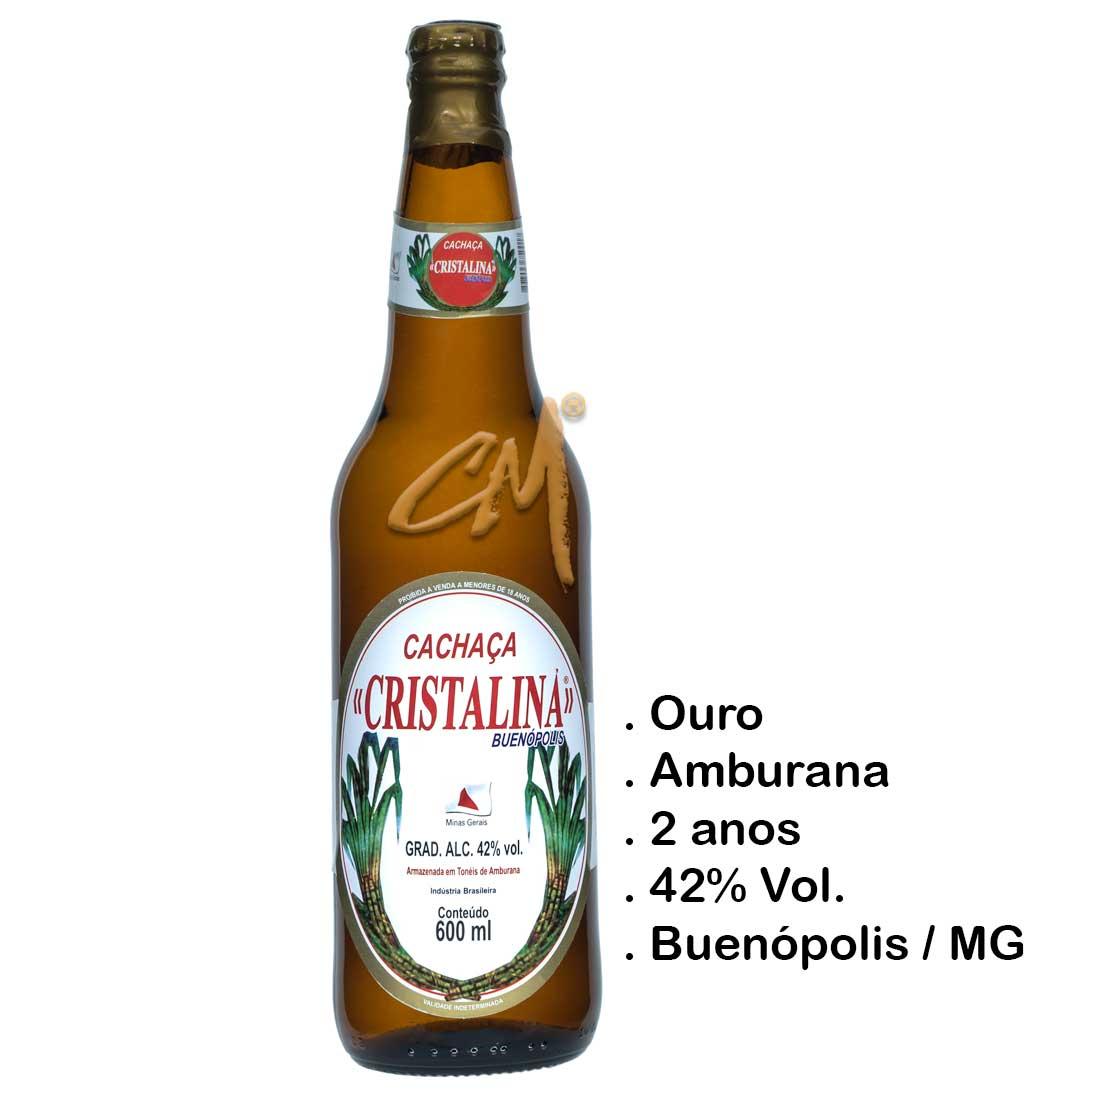 Cachaça Cristalina 600 ml (Buenópolis - MG)